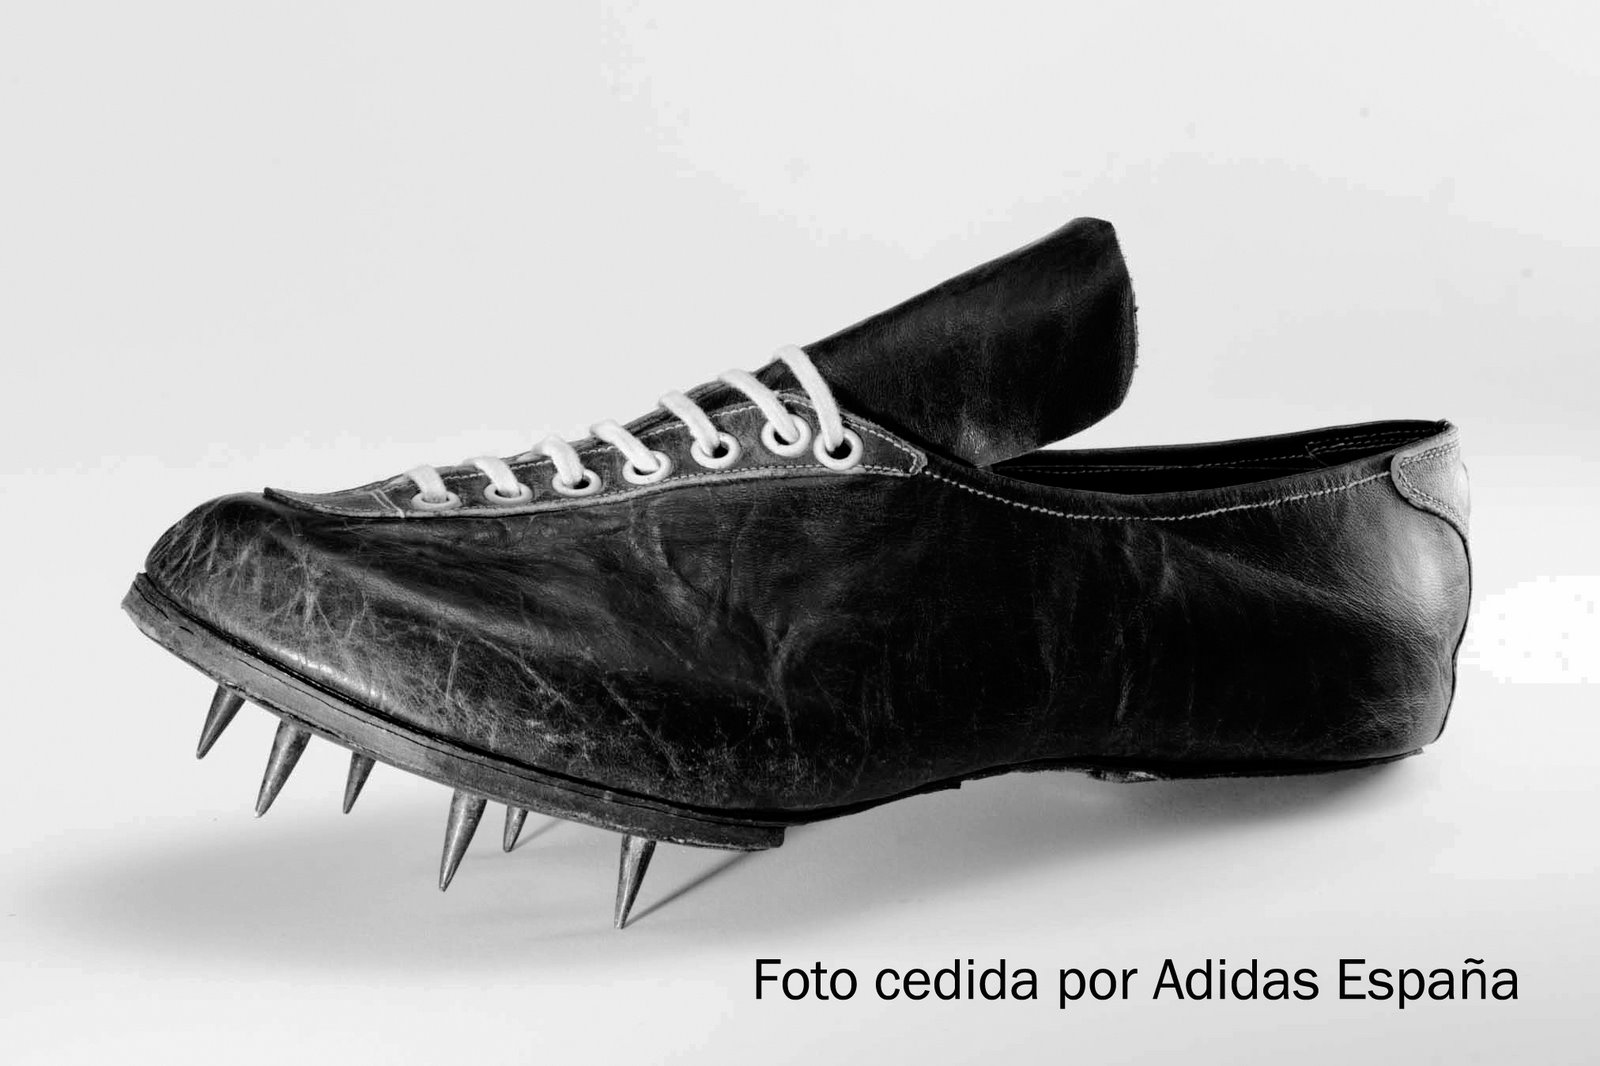 [Zapa_atletismo_adidas_1928.jpg]